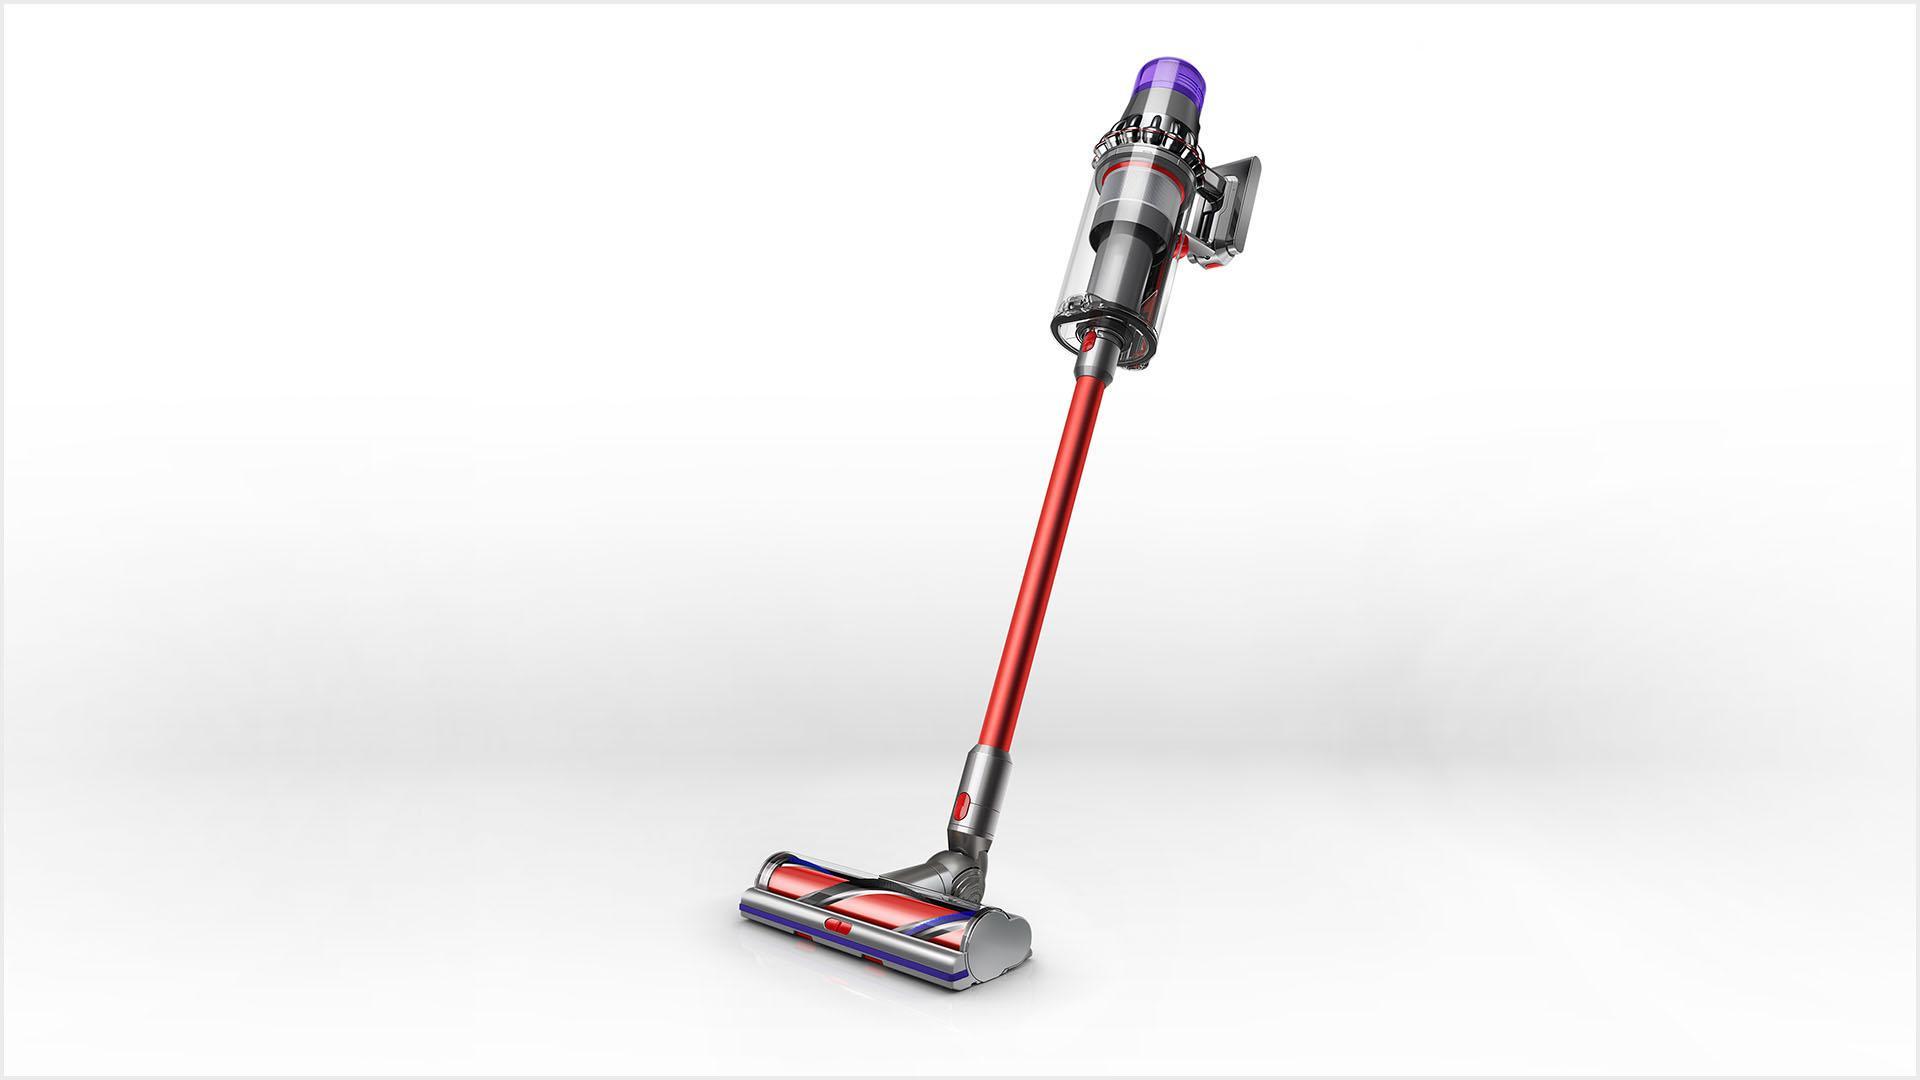 The Dyson V11 Outsize vacuum